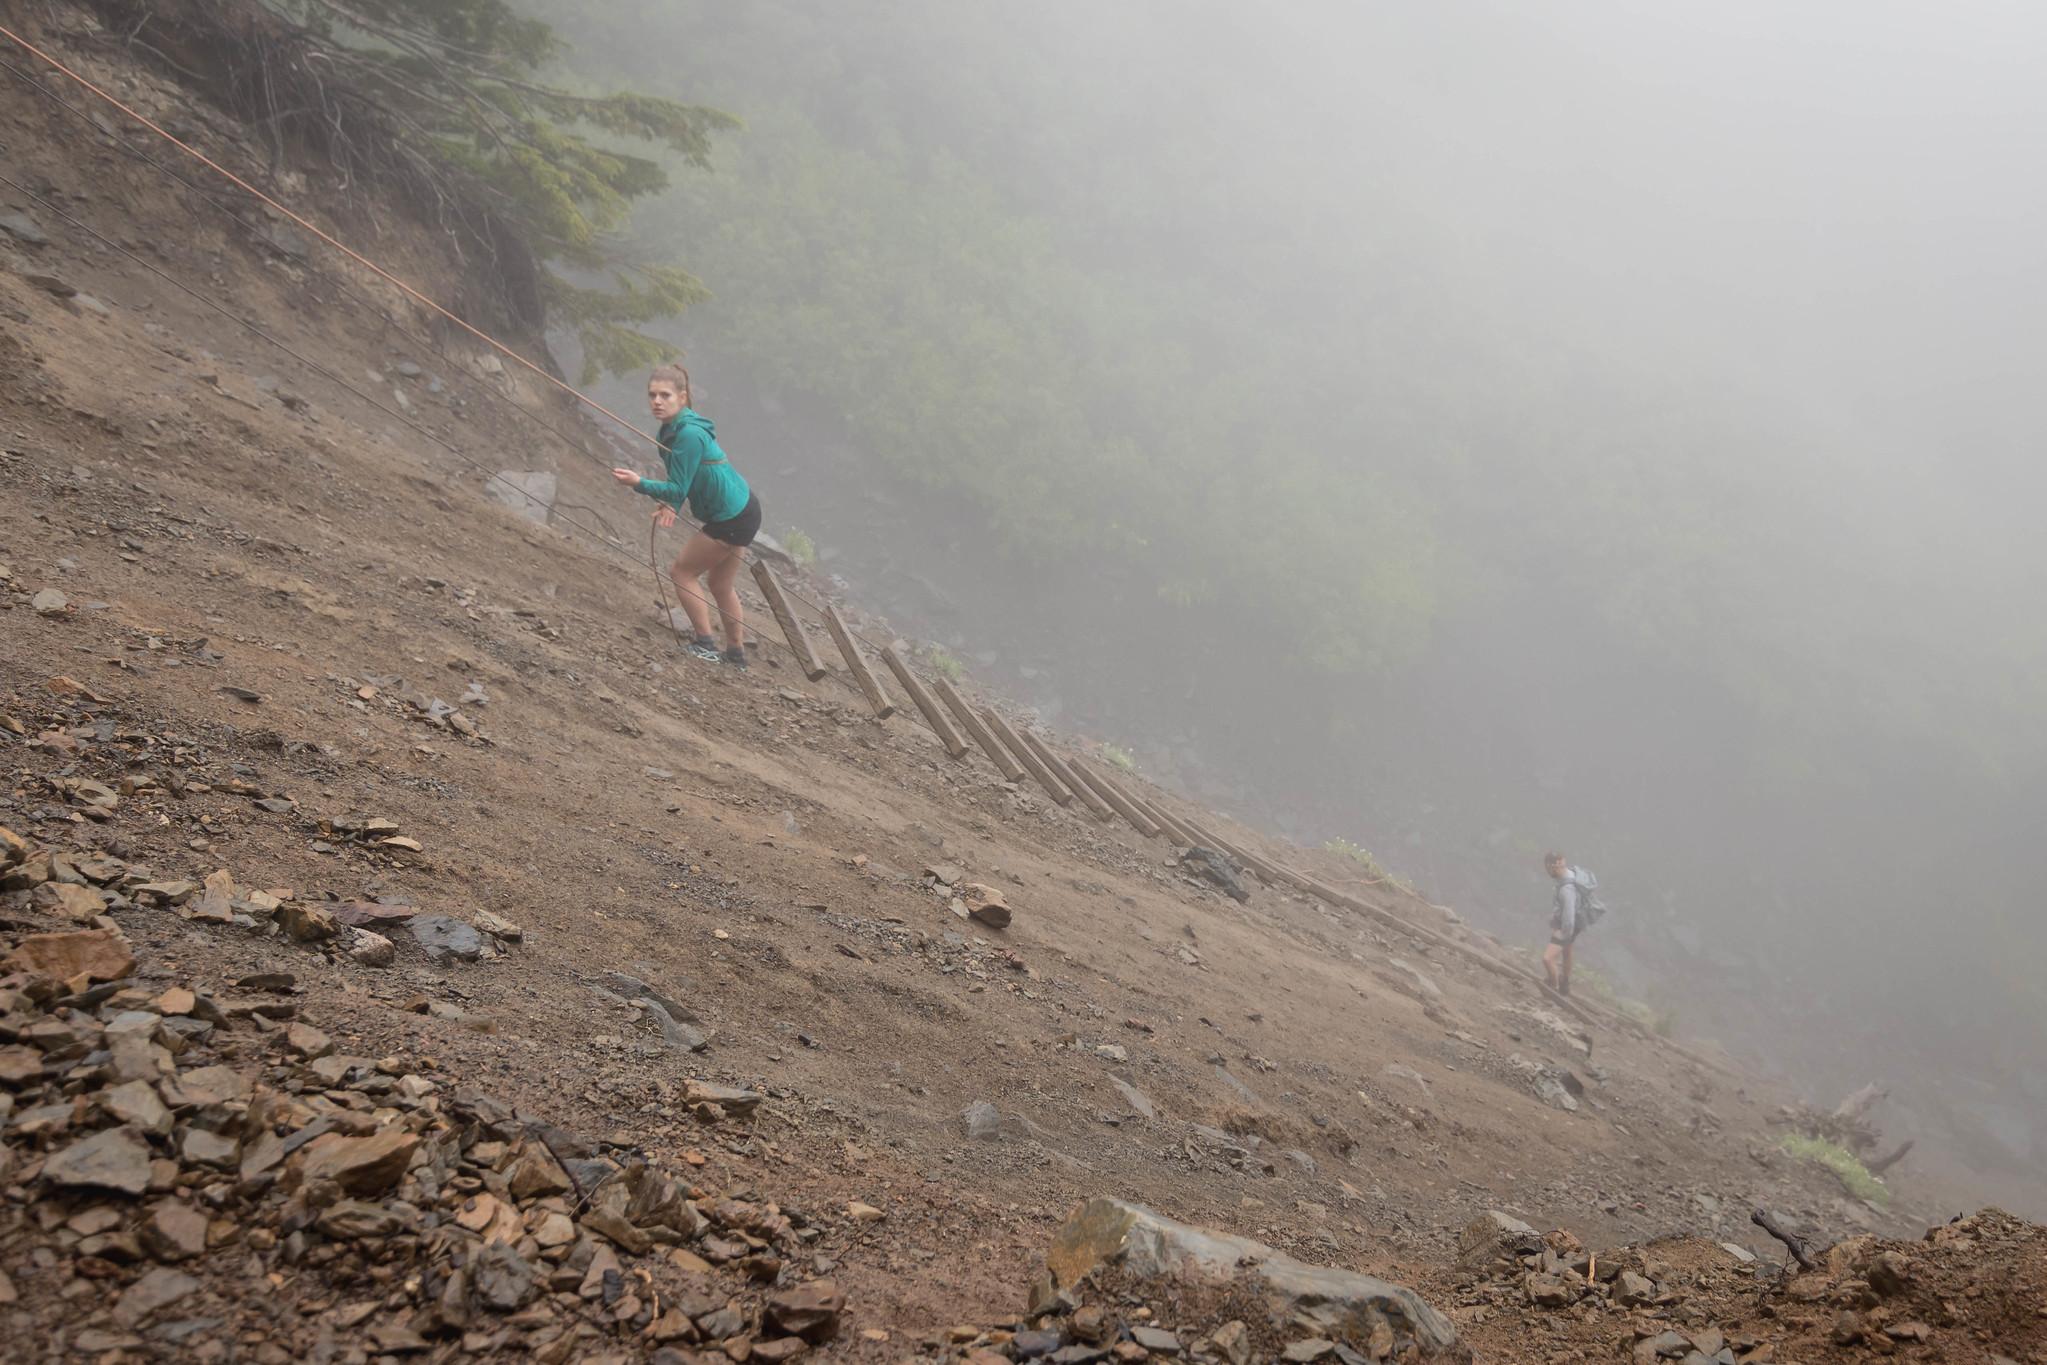 Landslide with rope and ladder